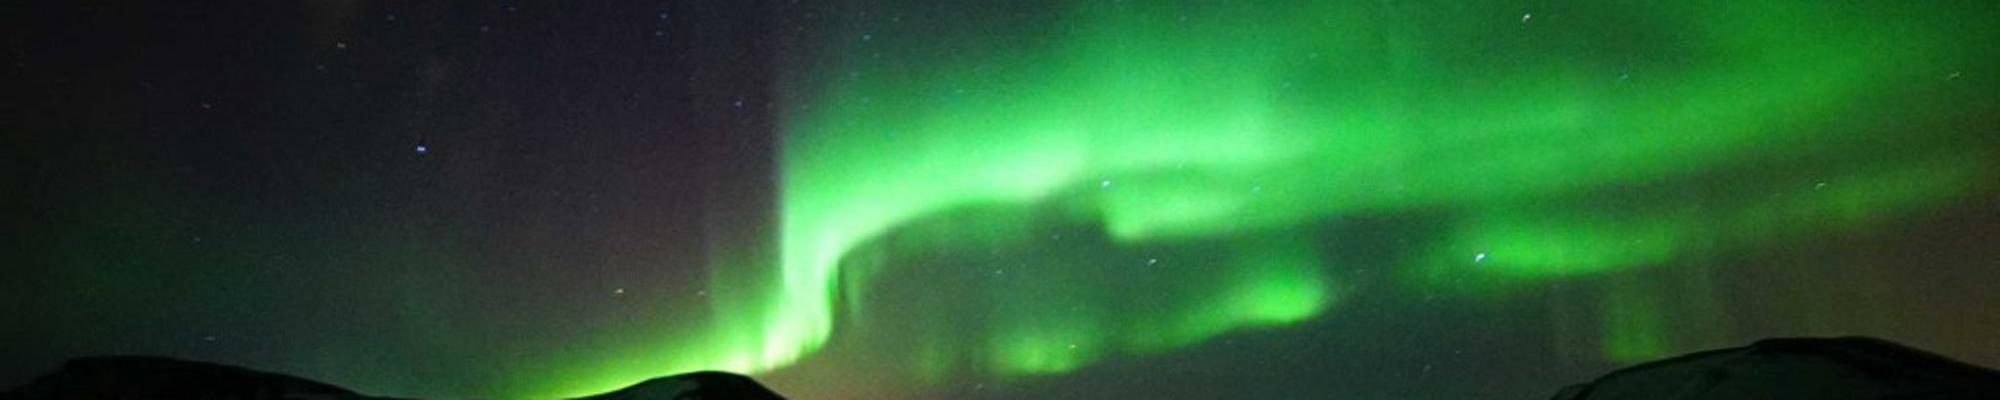 northern lights thorsmork national park